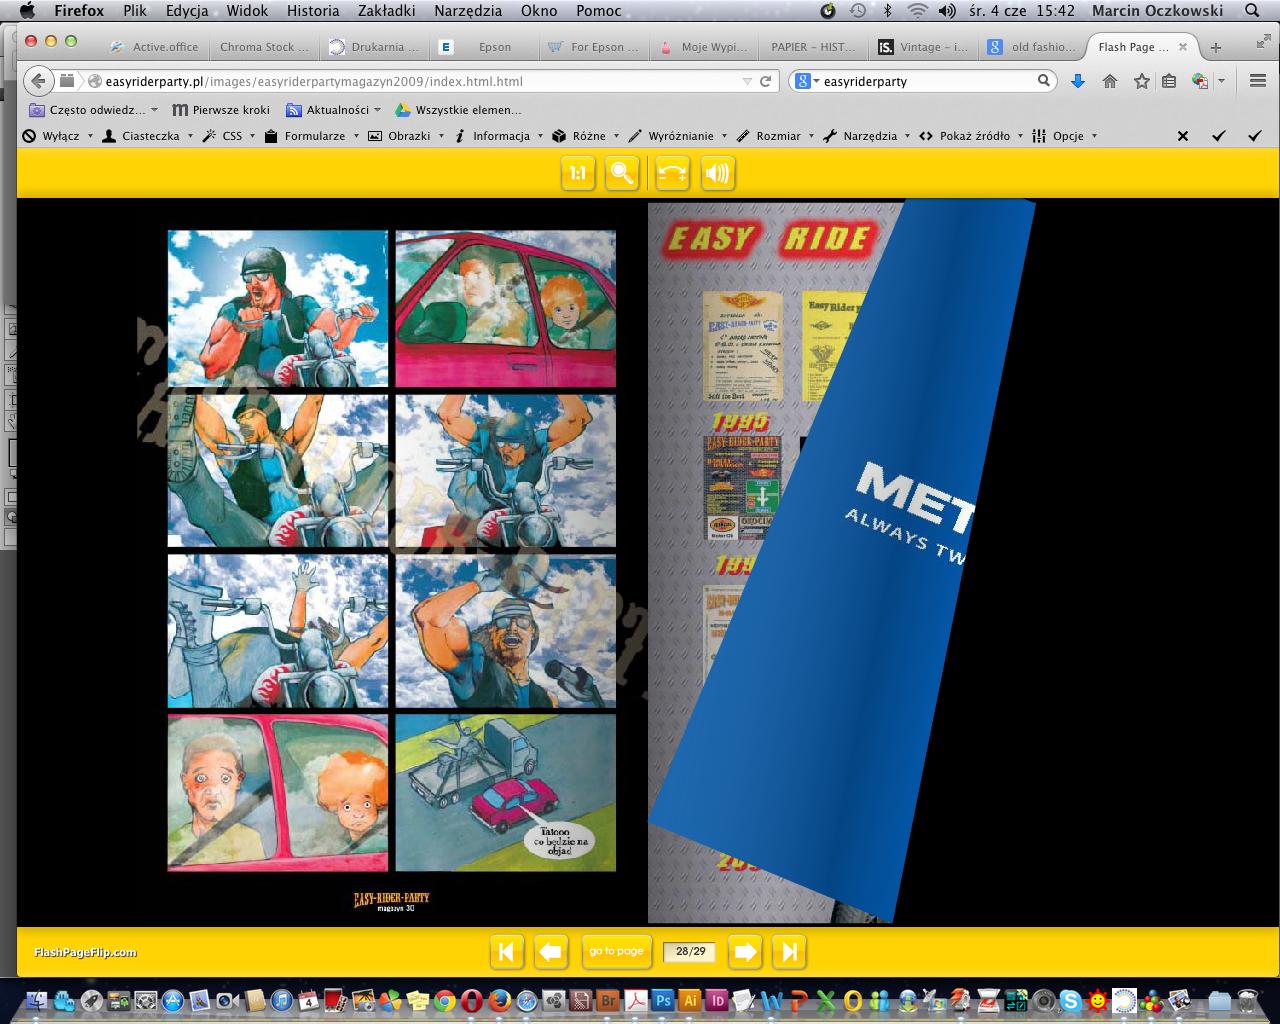 Zrzut ekranu 2014-06-4 o 15.42.38